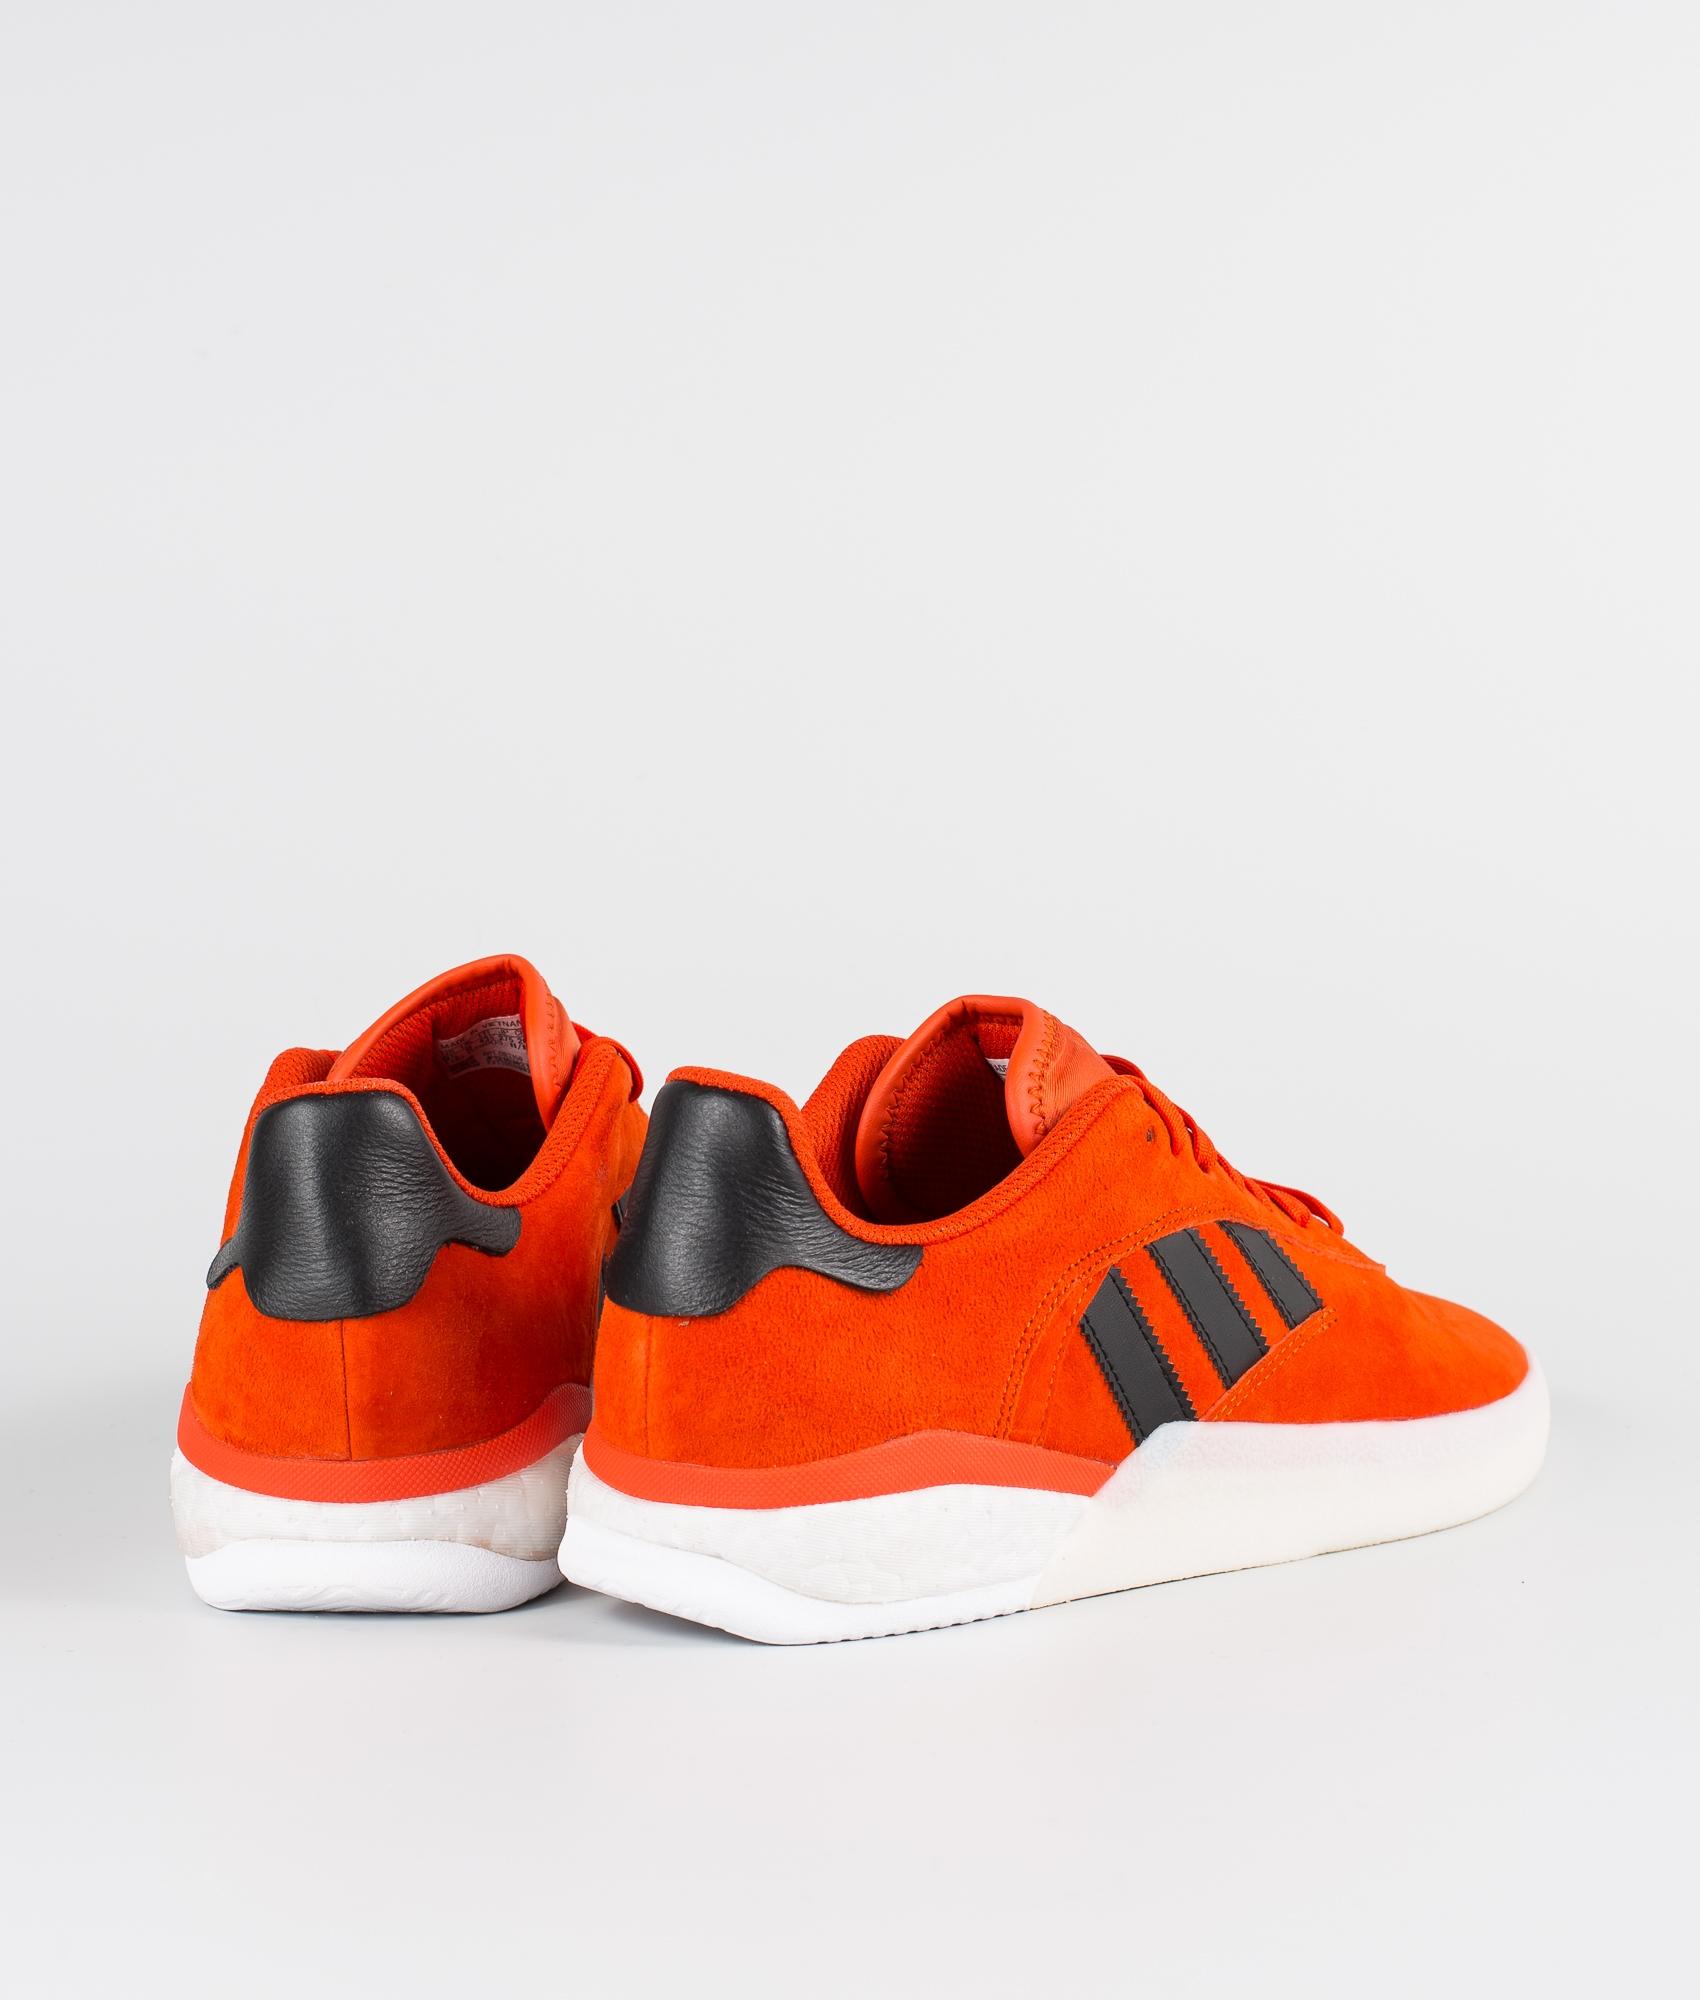 004 Adidas Collegiate Blackftwr Schuhe Skateboarding 3st Orangecore White PXuOZiTwlk